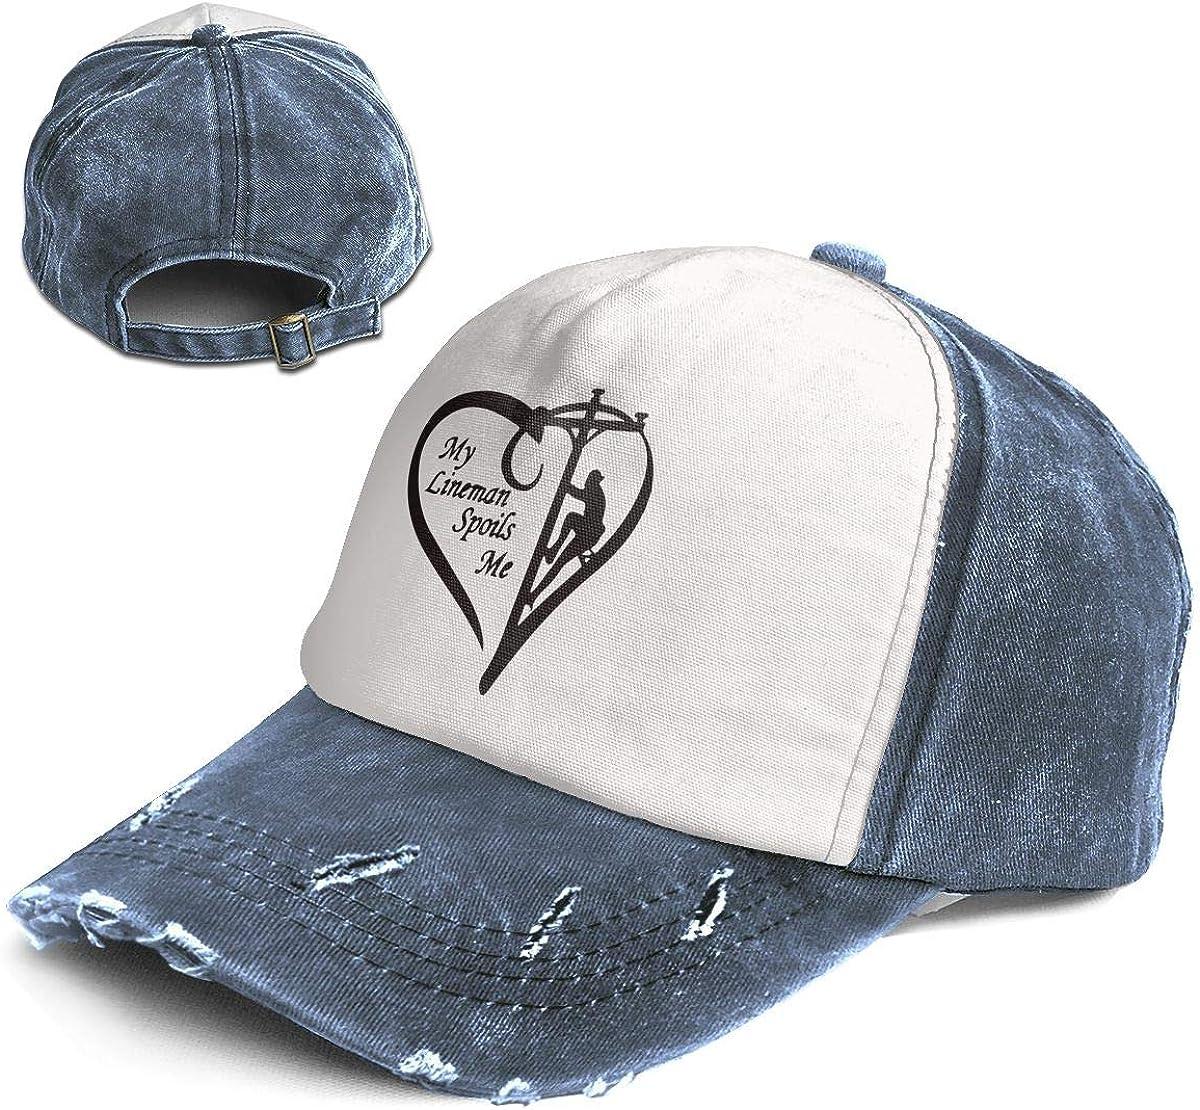 Fashion Vintage Hat My Lineman Spoils Me Adjustable Dad Hat Baseball Cowboy Cap